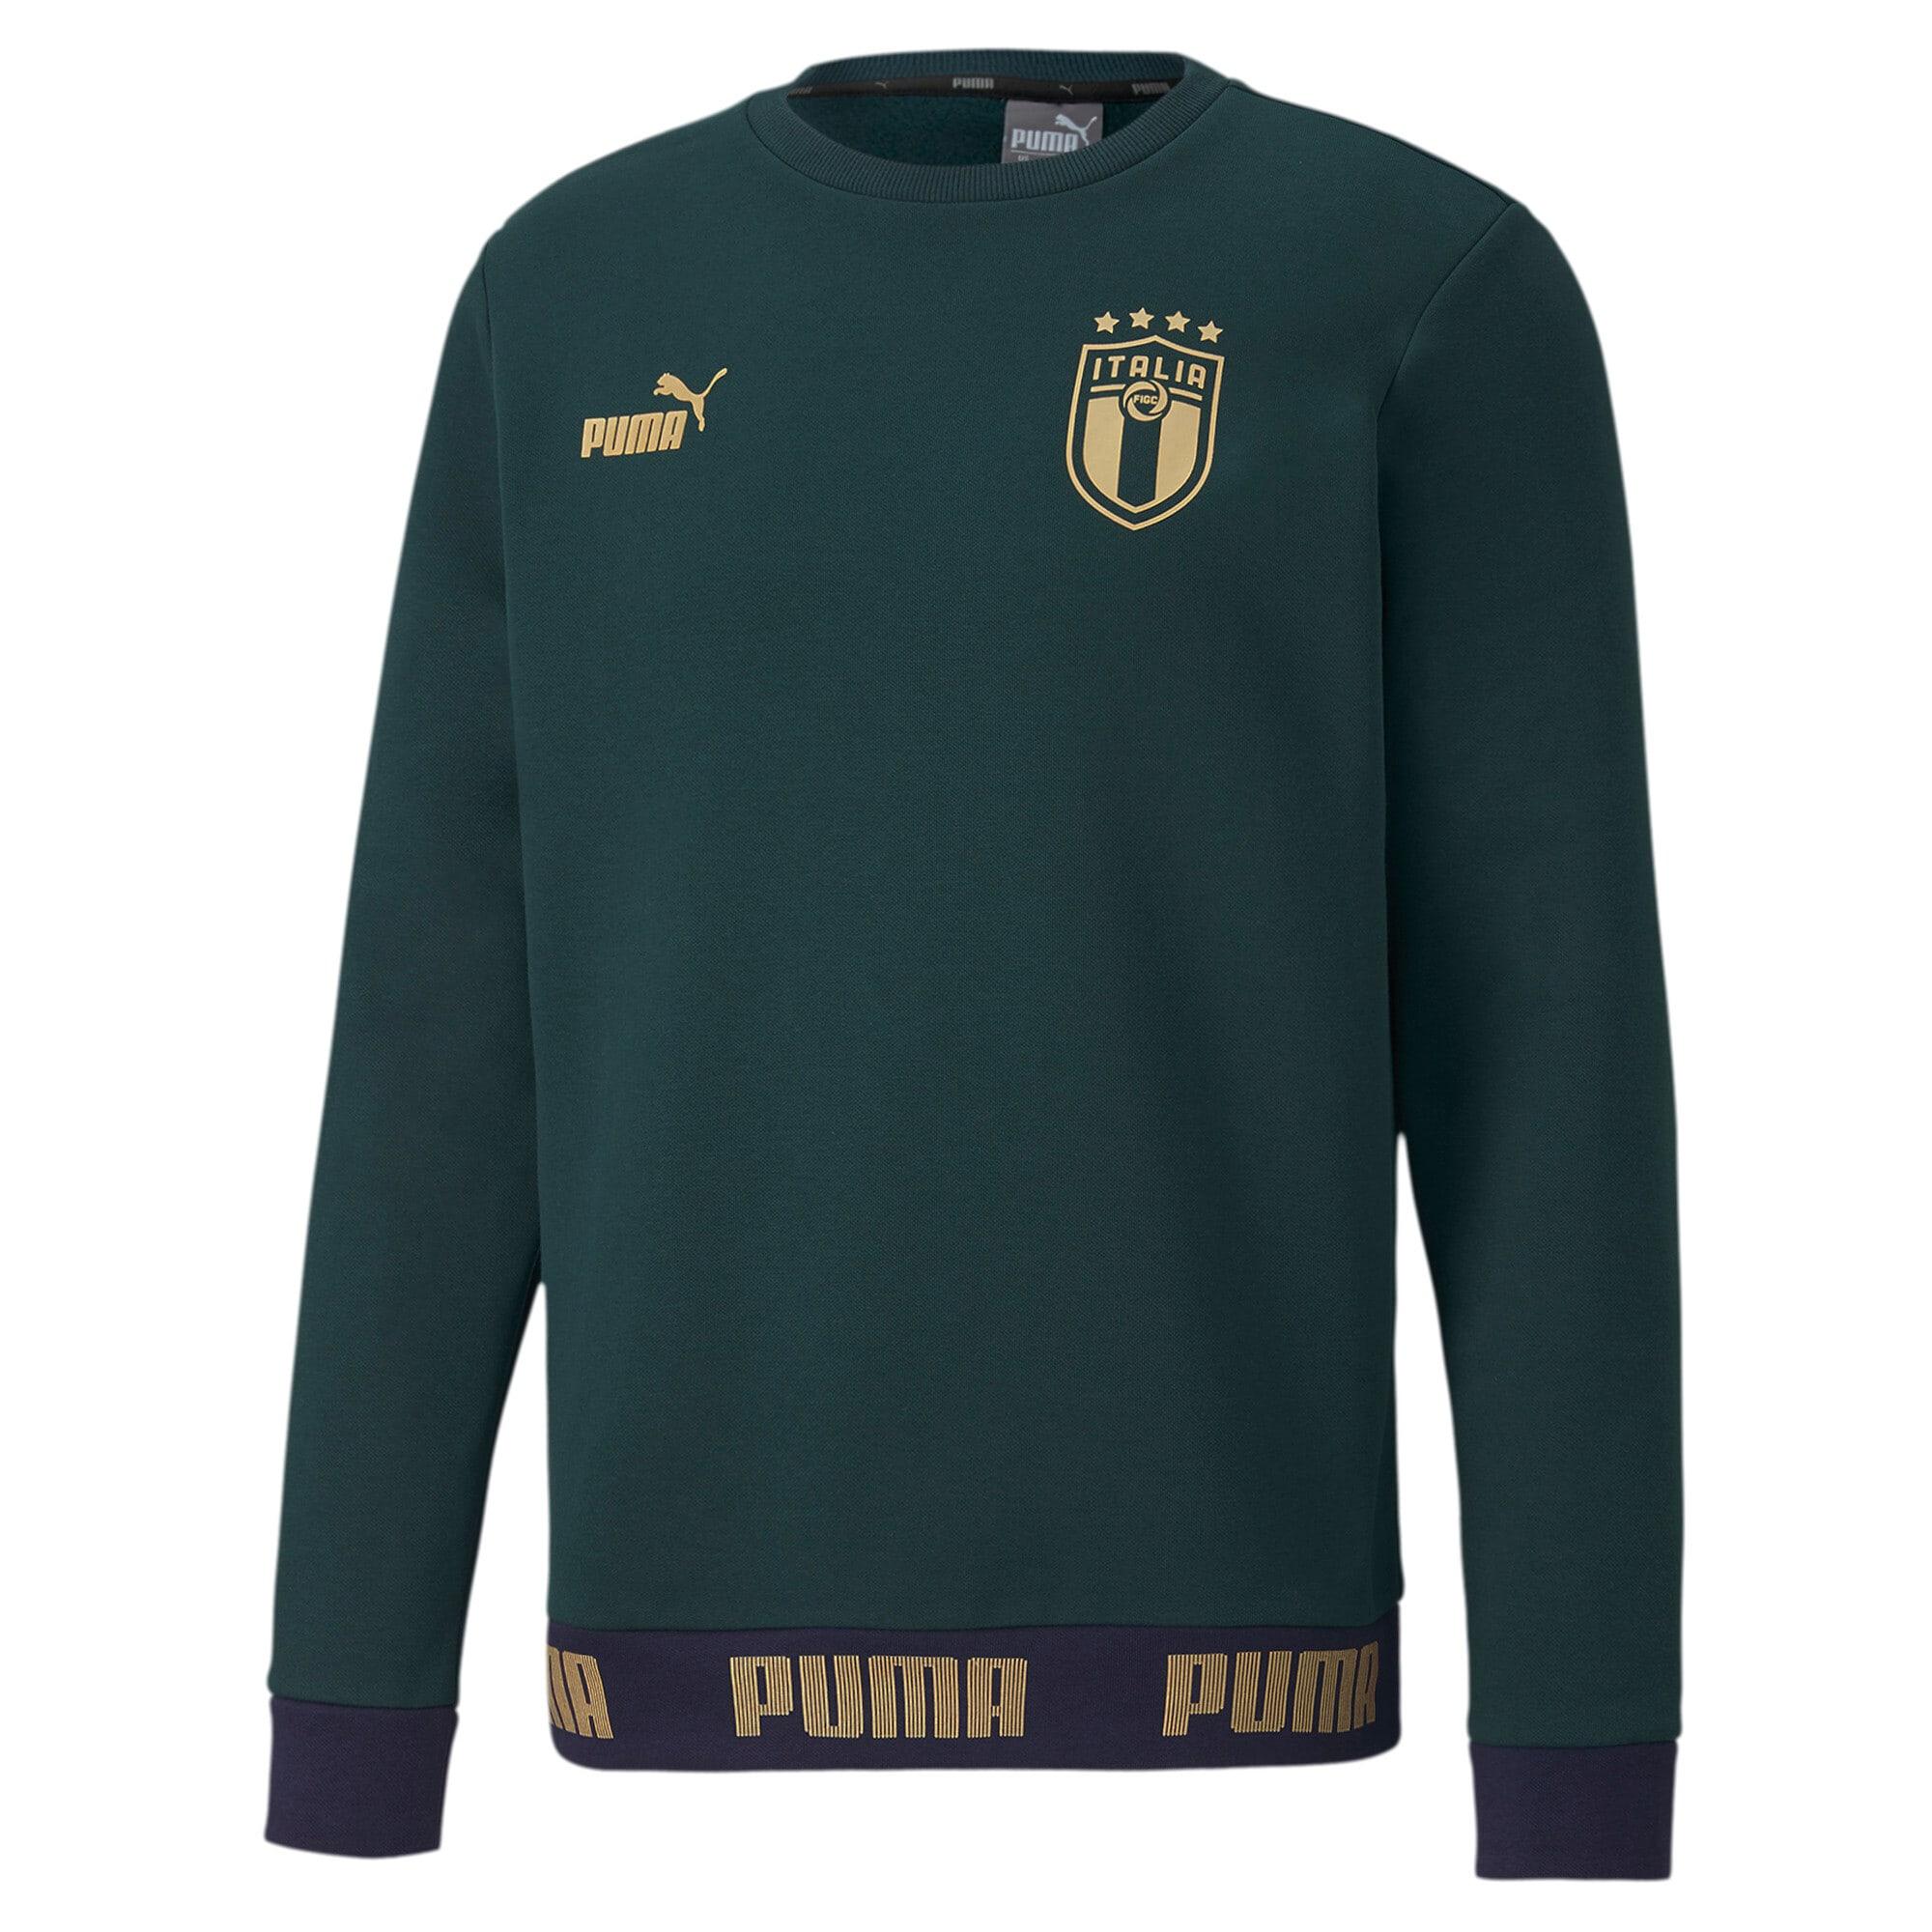 Thumbnail 1 of FIGC イタリア FTBL CULTURE クルースウェット, Ponderosa Pine-Team Gold, medium-JPN